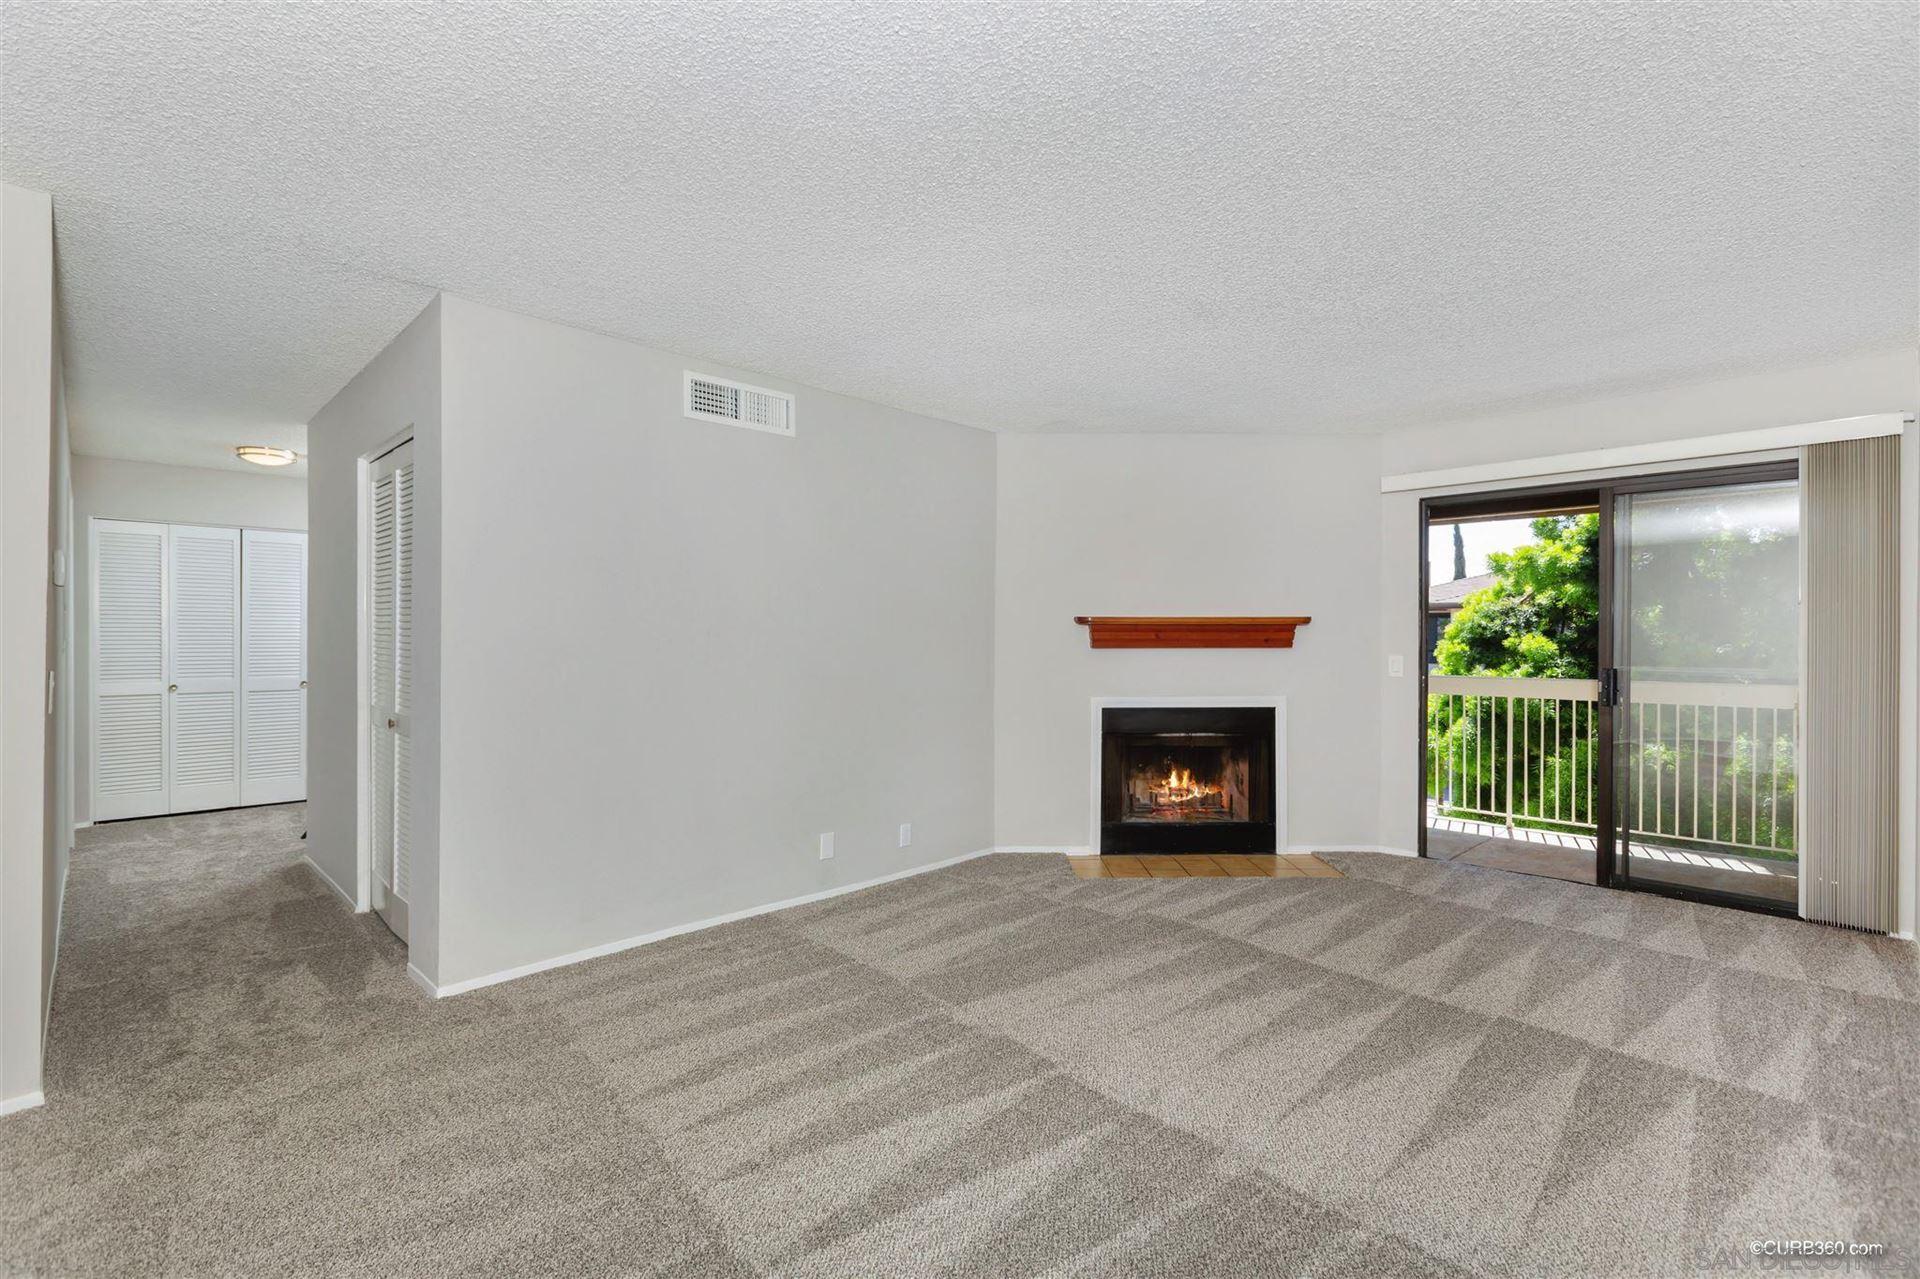 Photo of 4262 Parks Ave #201, La Mesa, CA 91941 (MLS # 210009074)